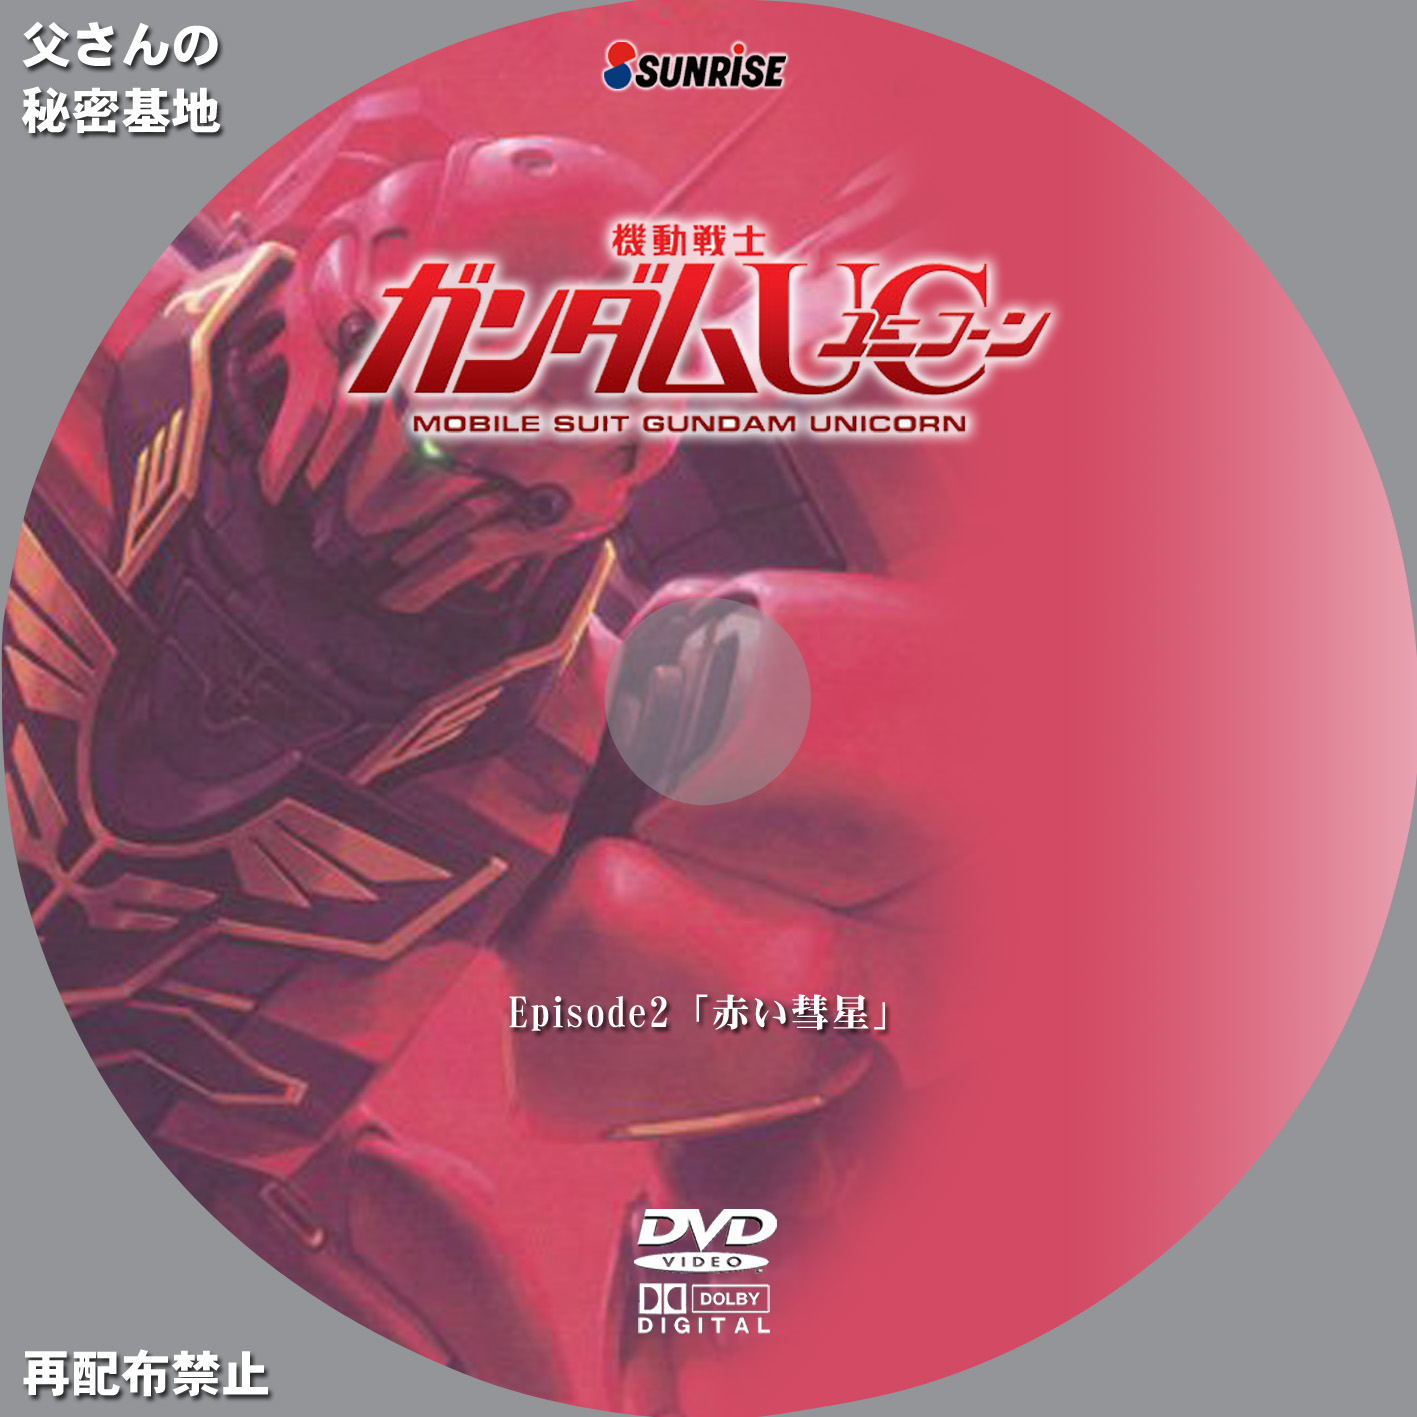 UNICORN_02_DVD.jpg